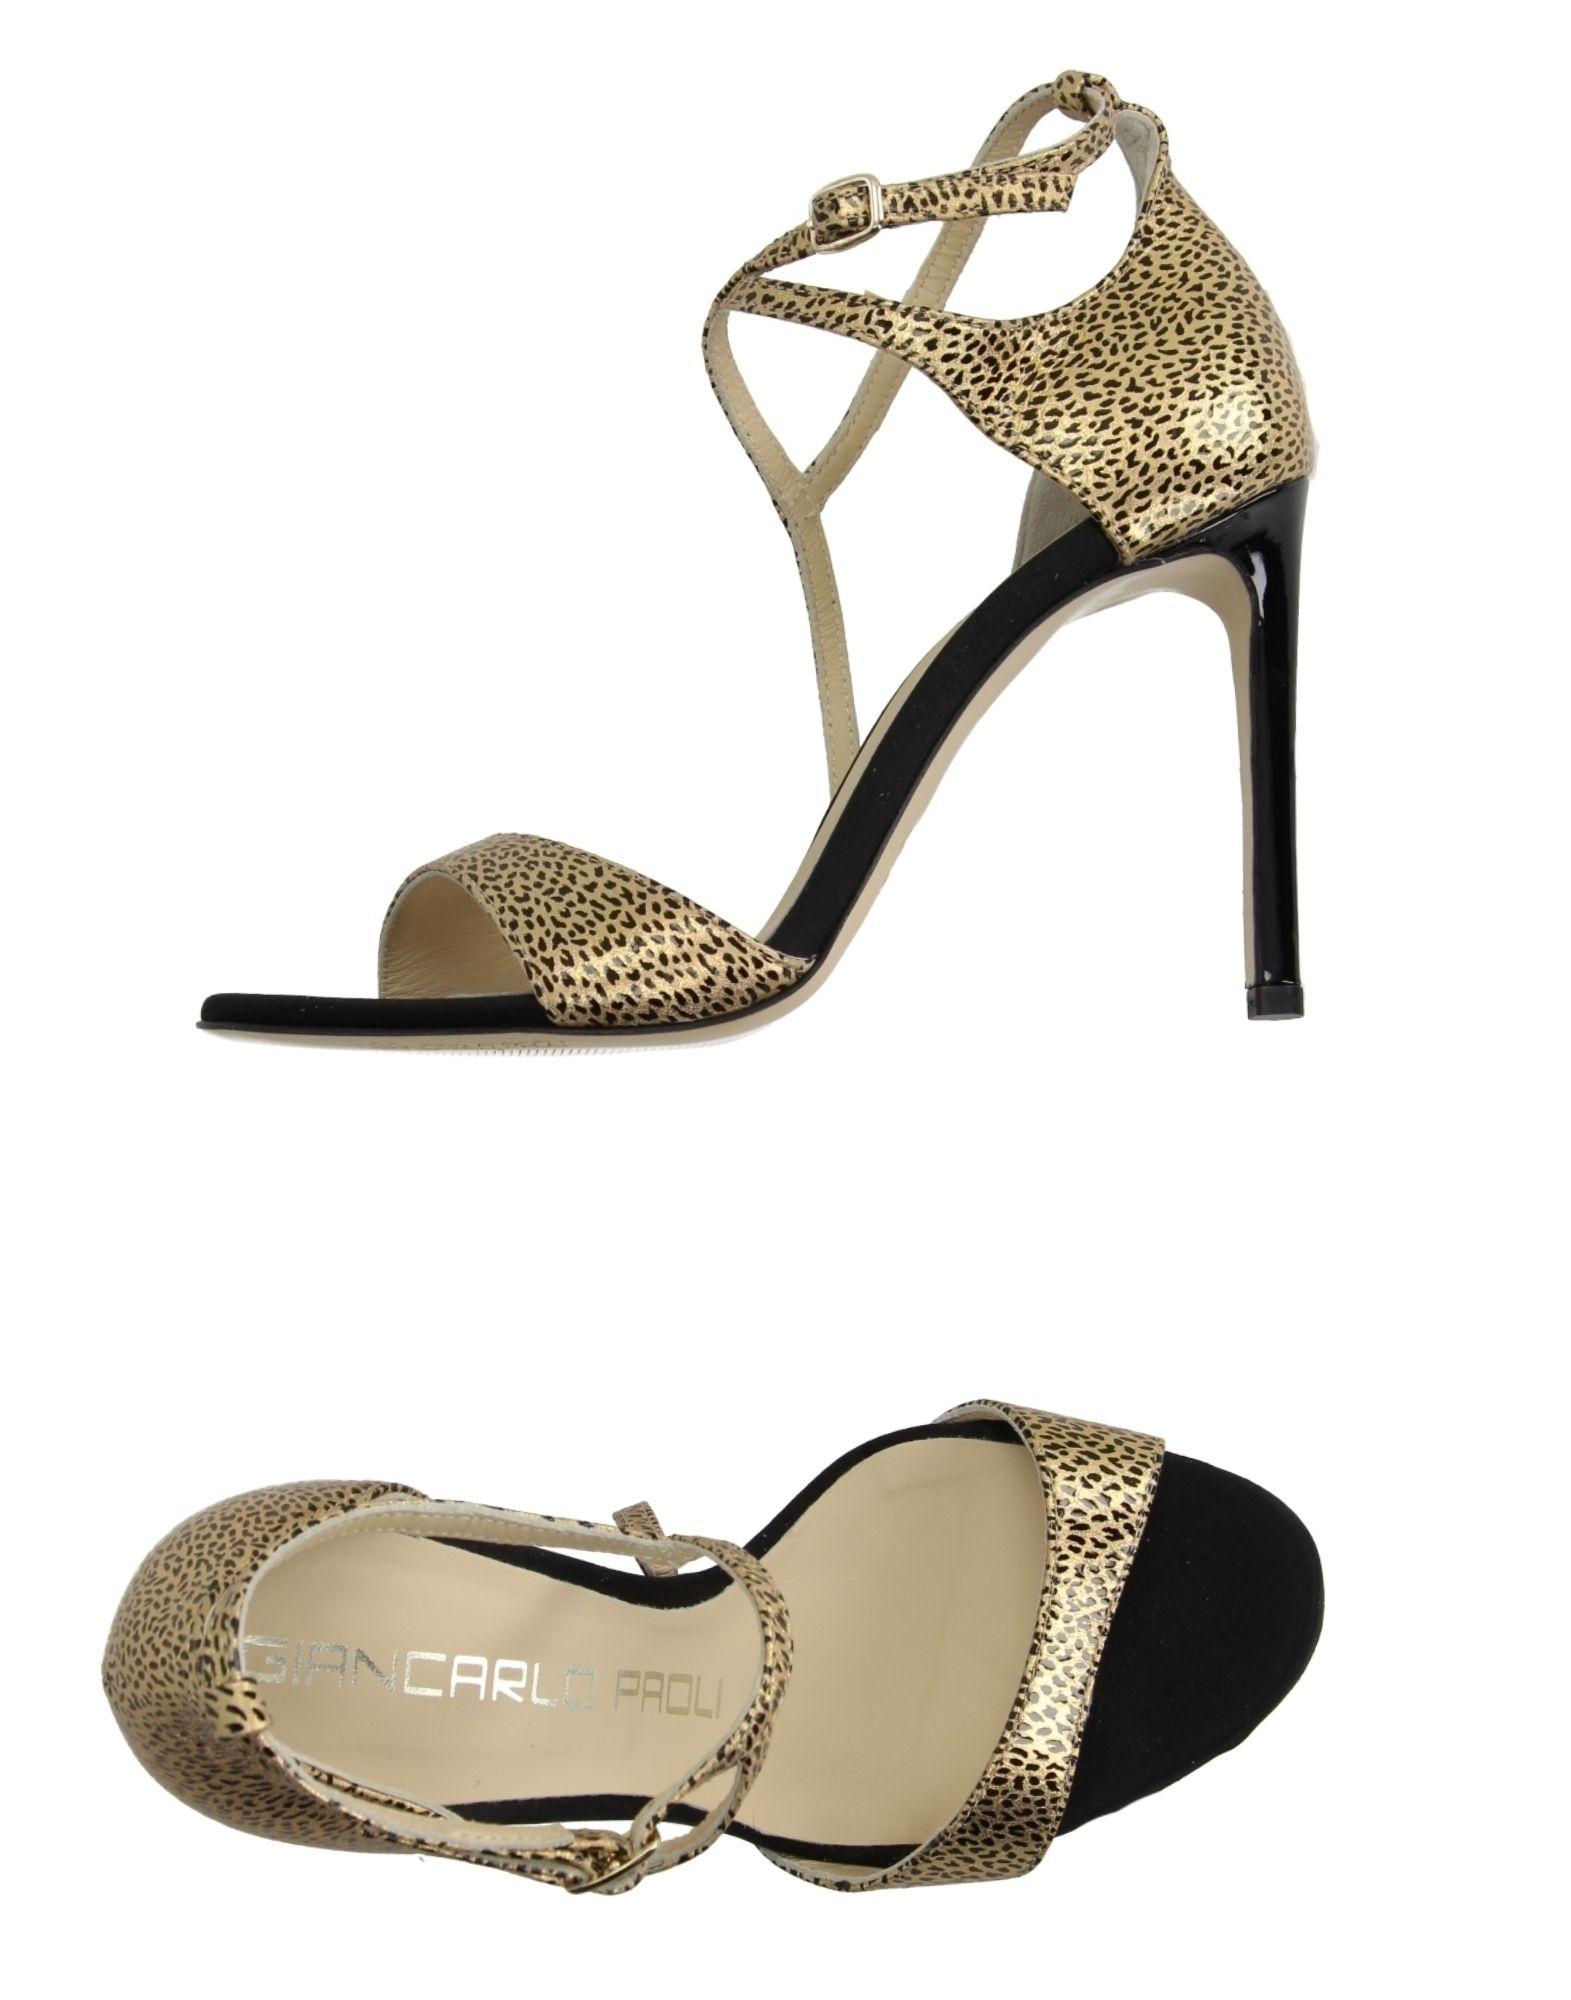 Giancarlo Paoli Sandalen Damen  11162221UOGut aussehende strapazierfähige Schuhe